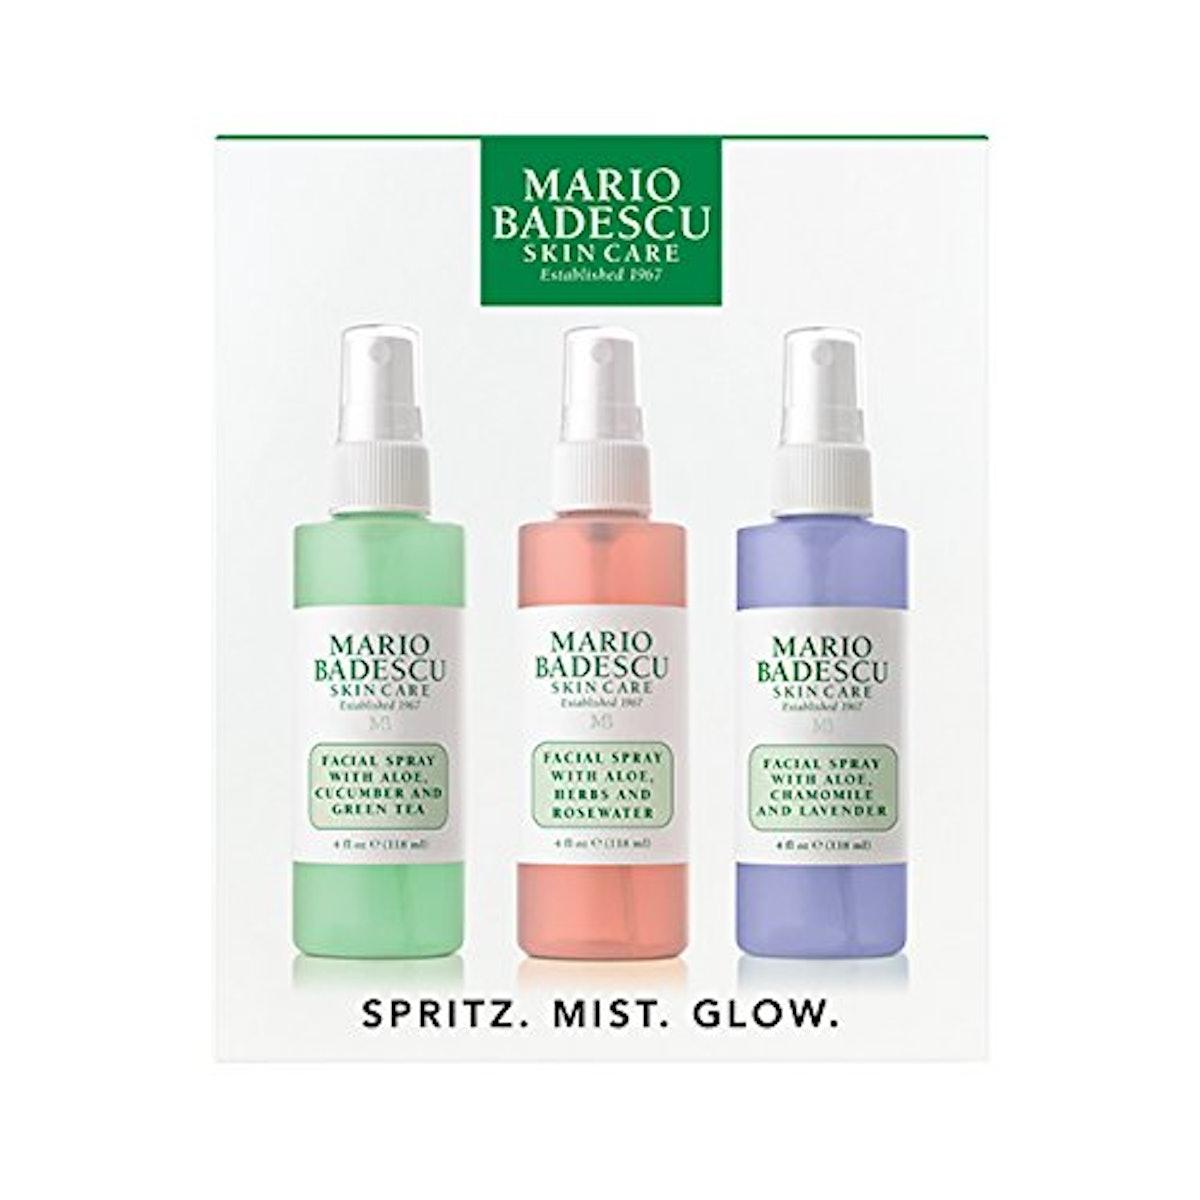 Mario Badescu Mist Facial Spray (3-Piece Set)